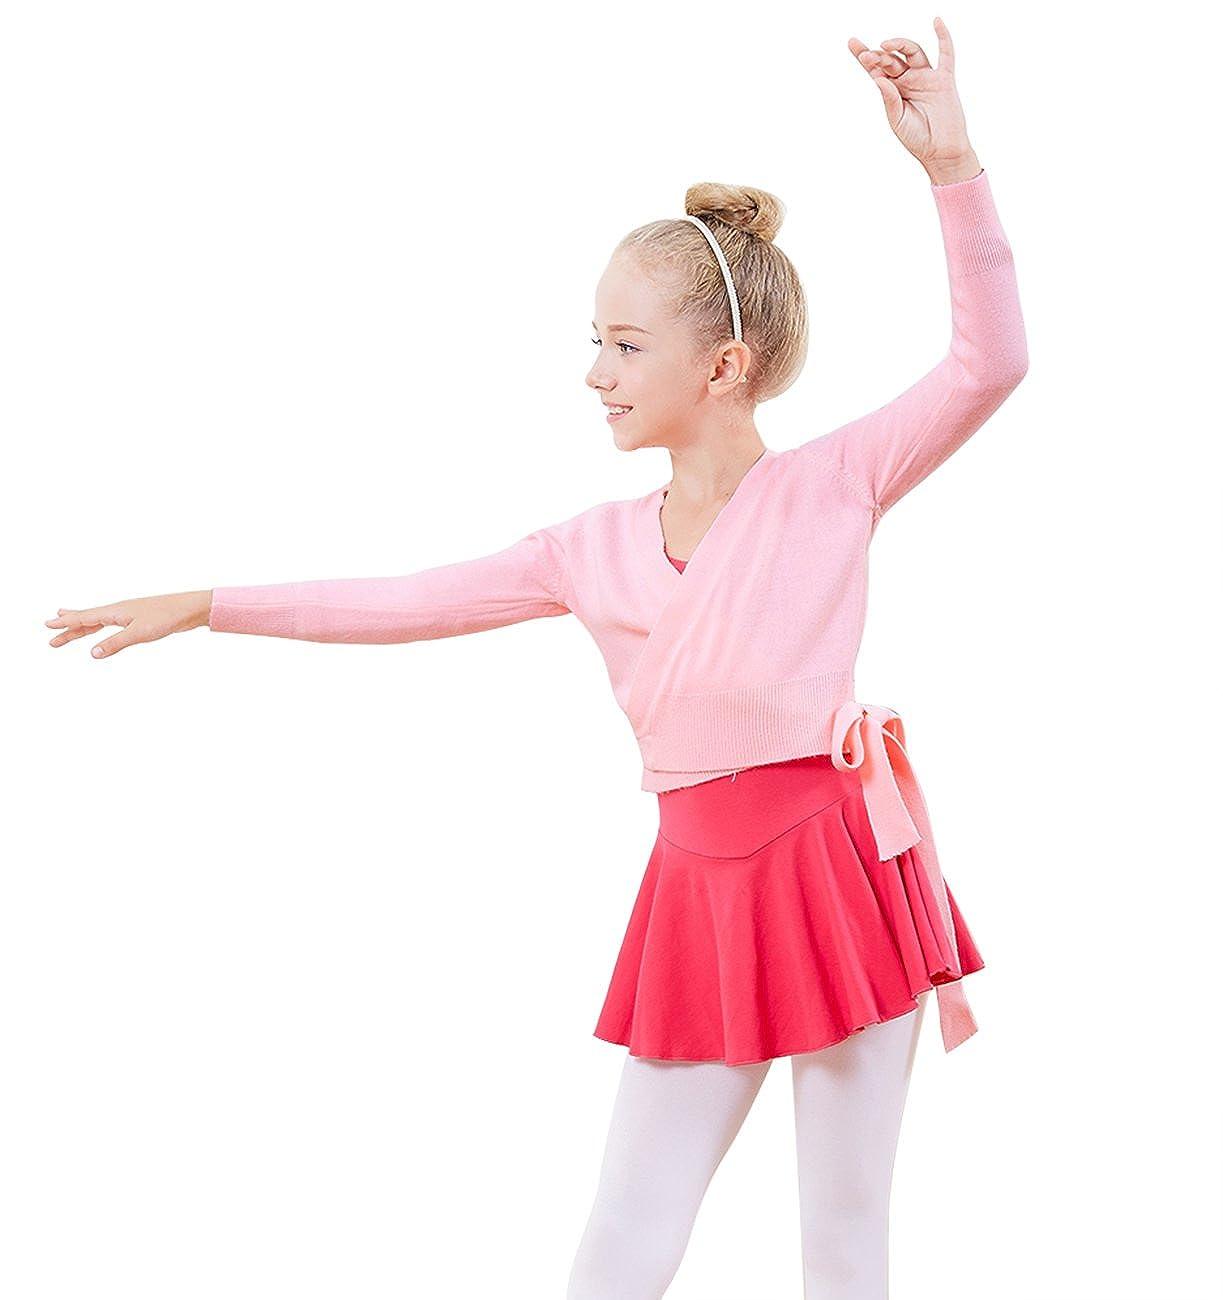 PINKDAA Kids Girl Dance Sweater Ballerina Long Sleeve Knit Wrap Top Ballet Cardigan